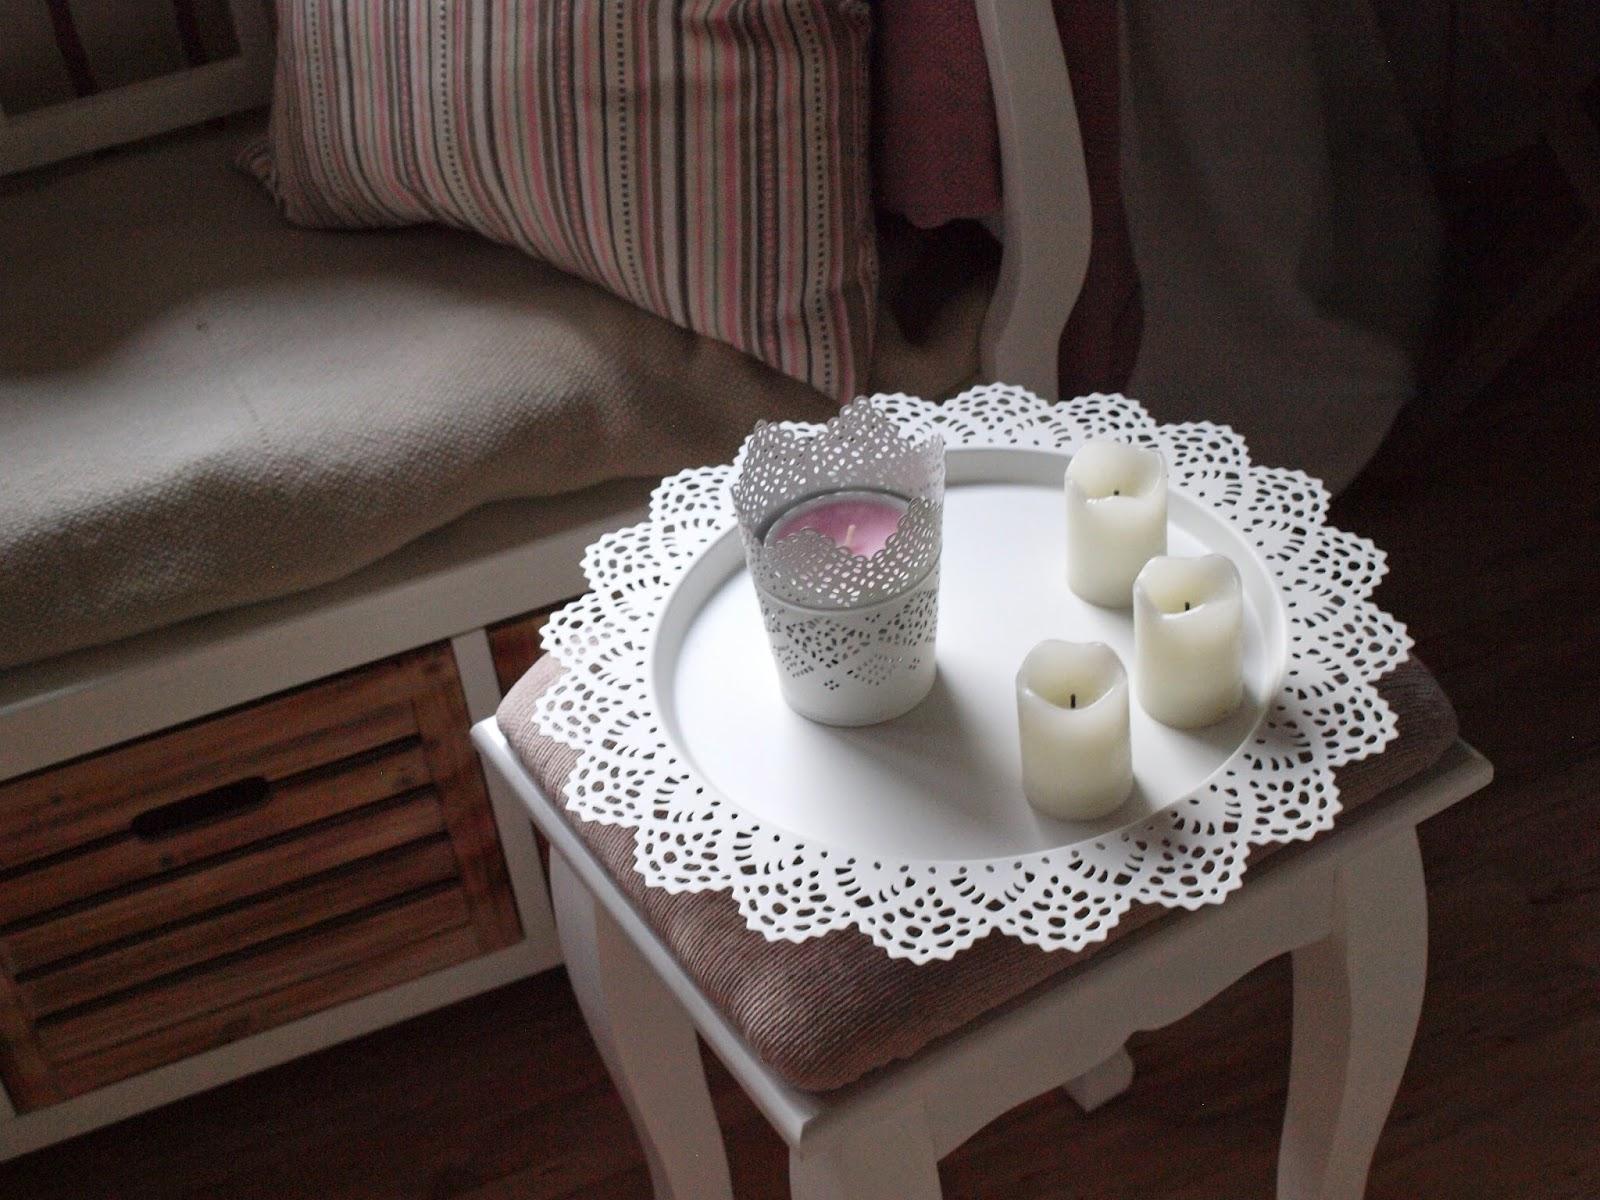 deartally a cozy place. Black Bedroom Furniture Sets. Home Design Ideas